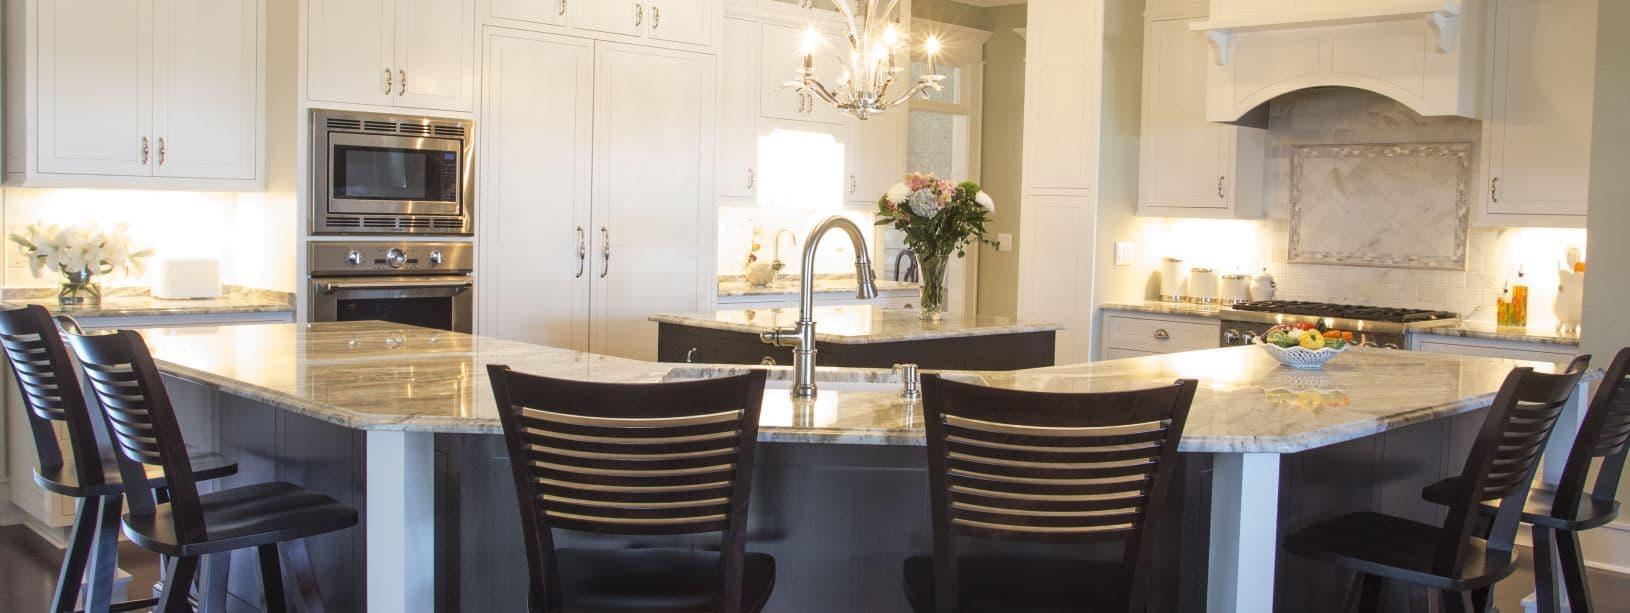 bandtkitchens inexpensive kitchen countertops You Dream It We Design It